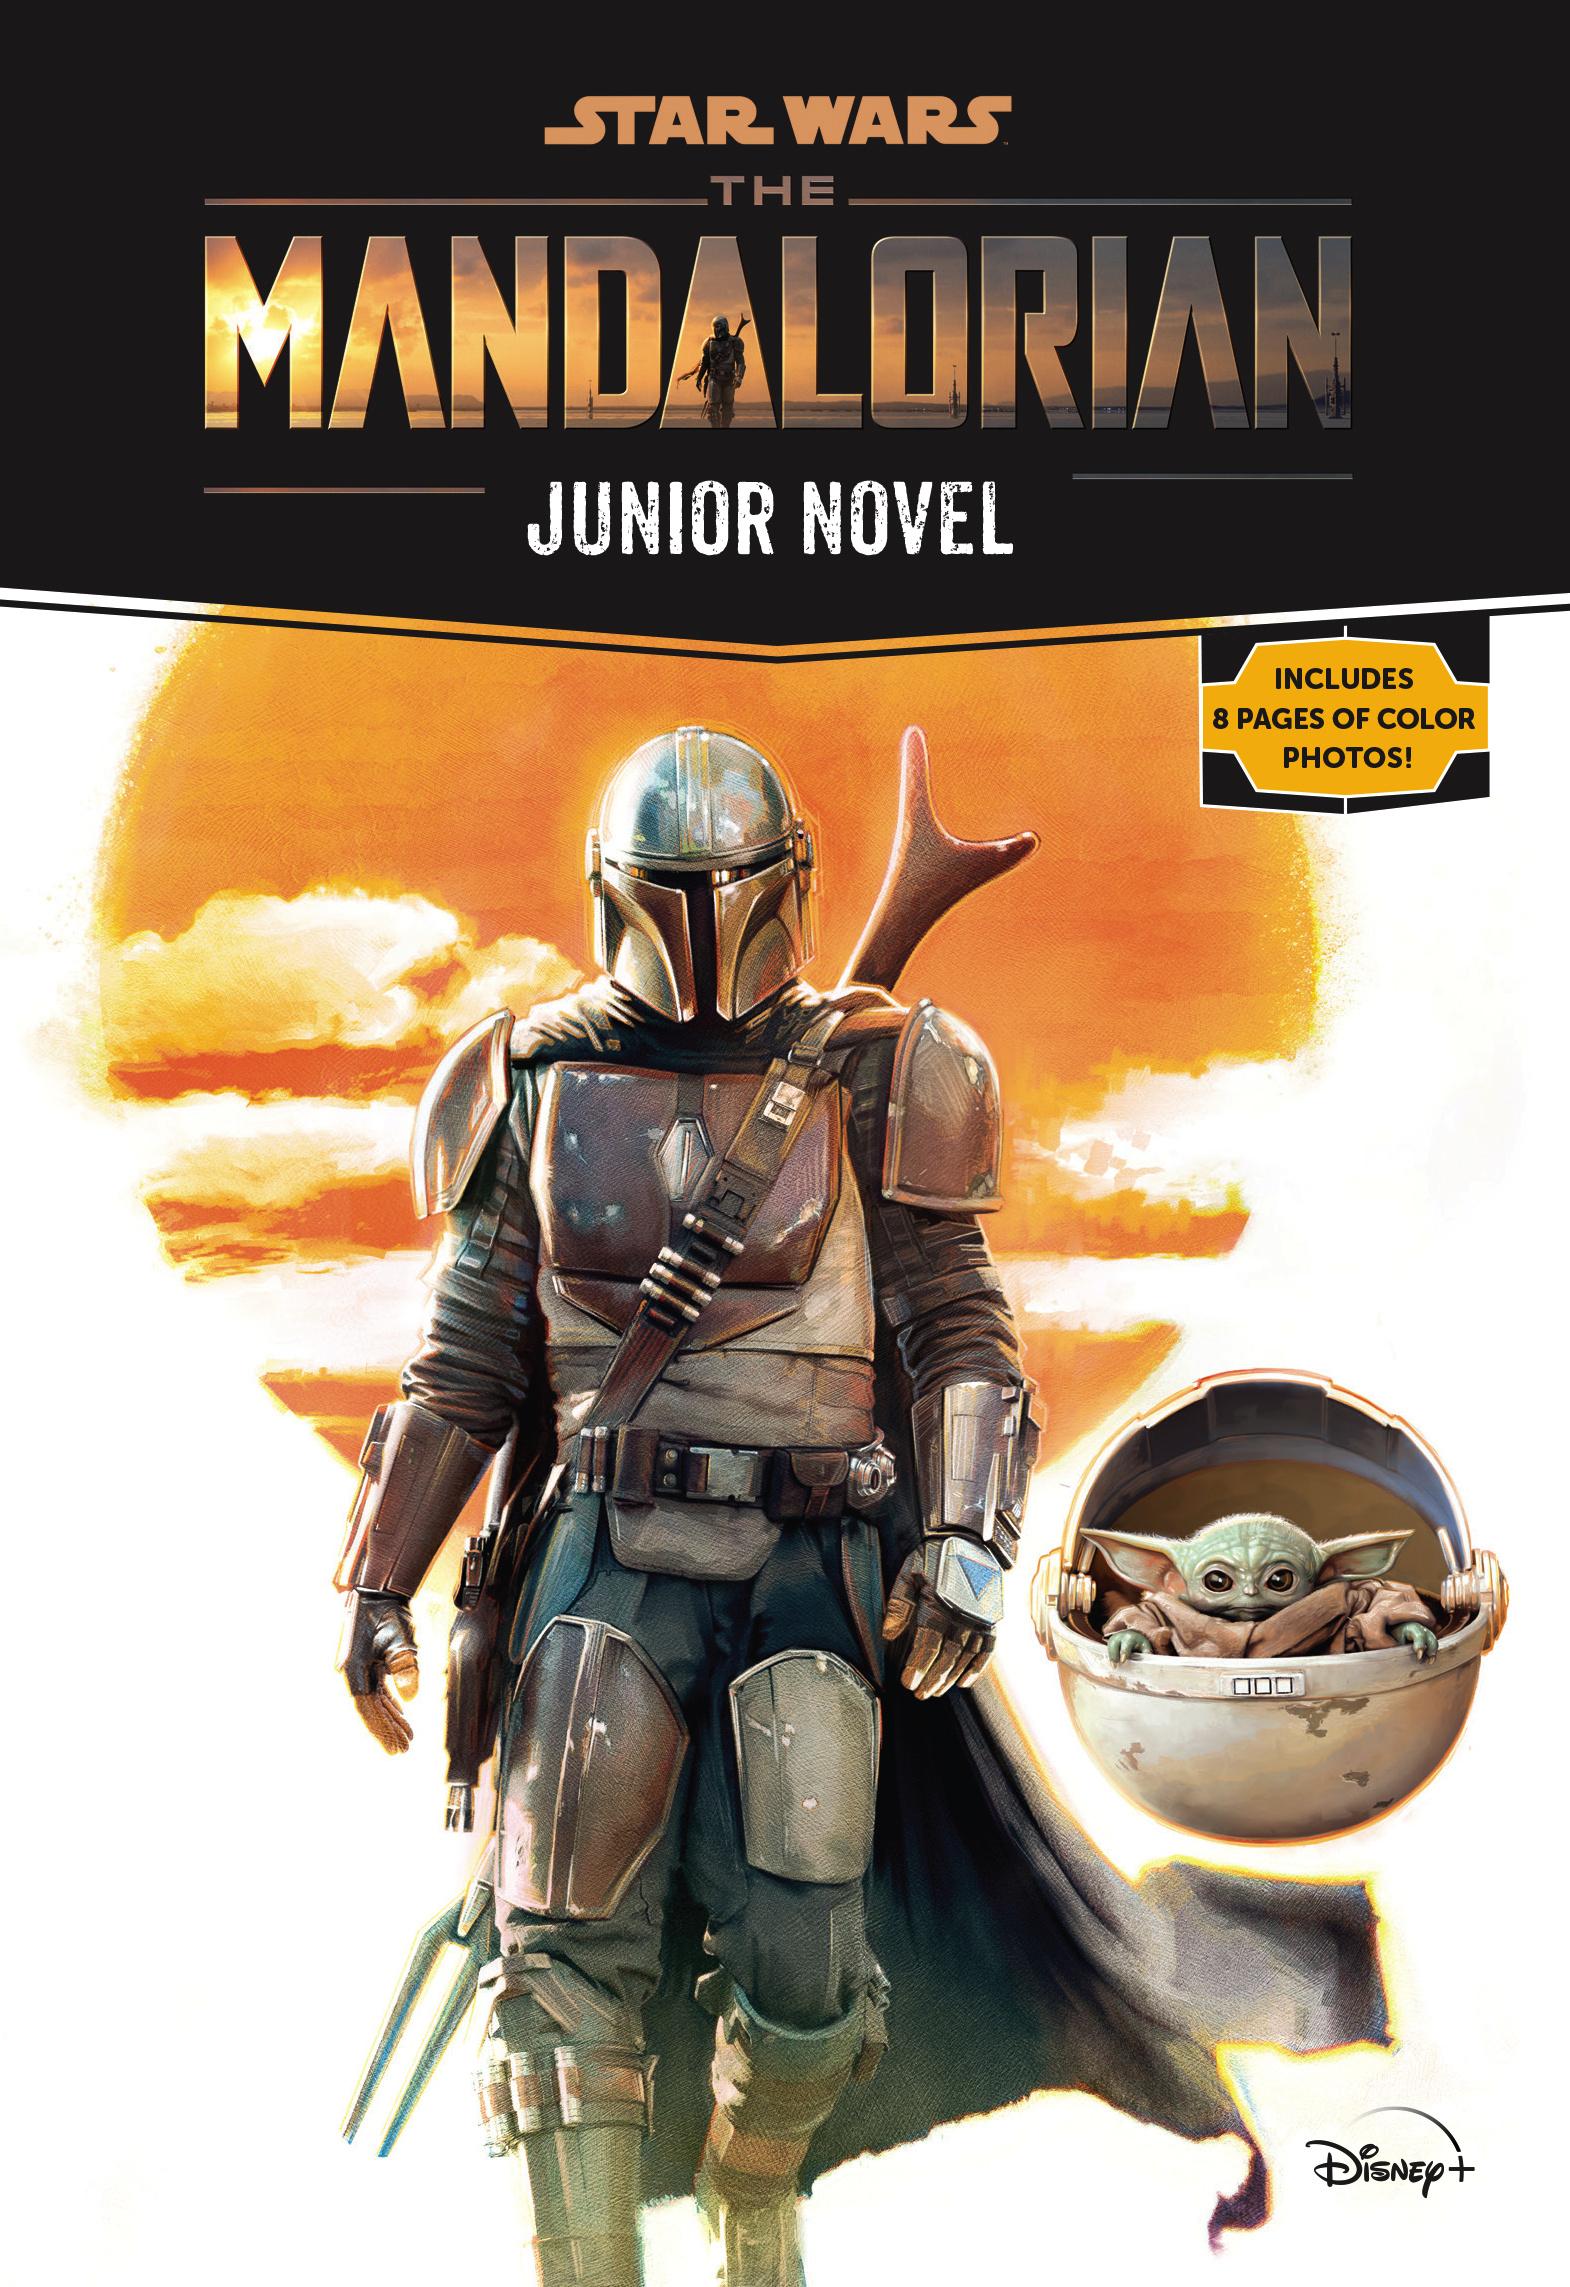 Star Wars: The Mandalorian Junior Novel